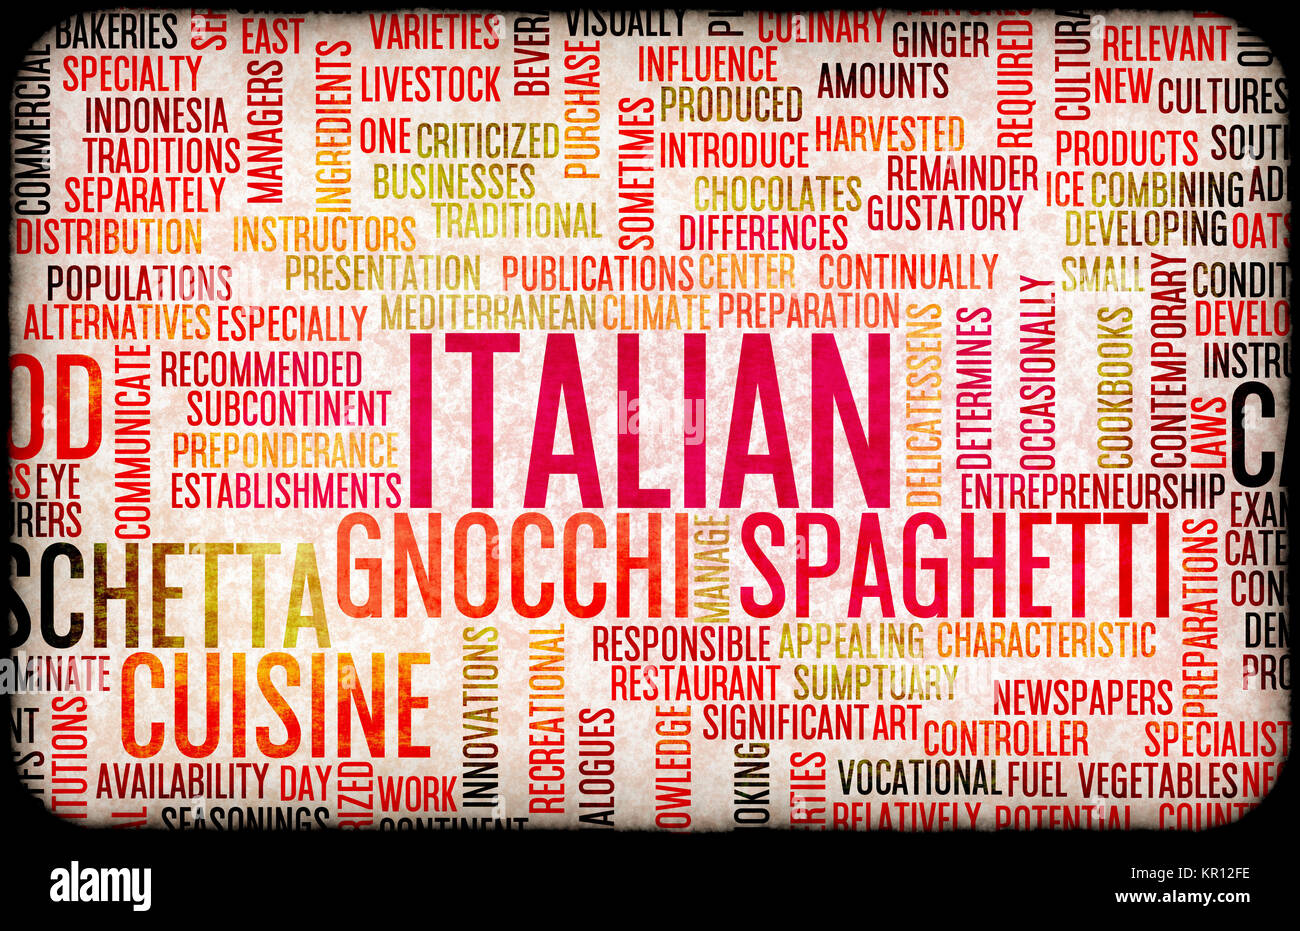 Tuscany Cafe Broad Street Menu